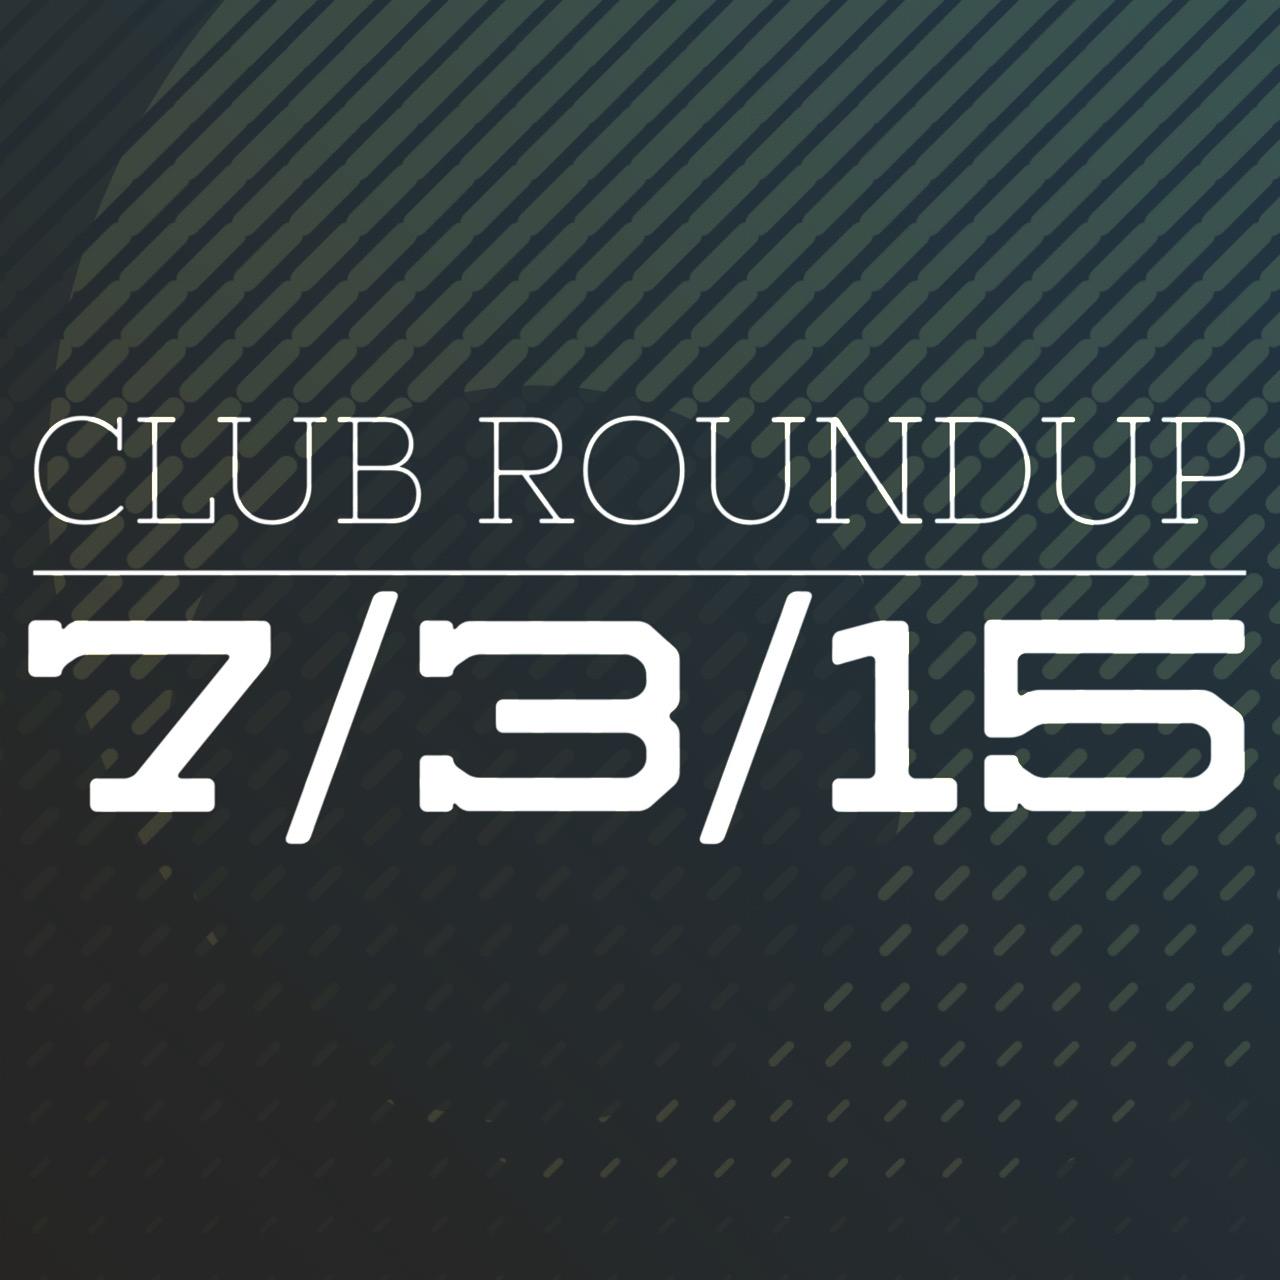 Club Roundup 7/3/15